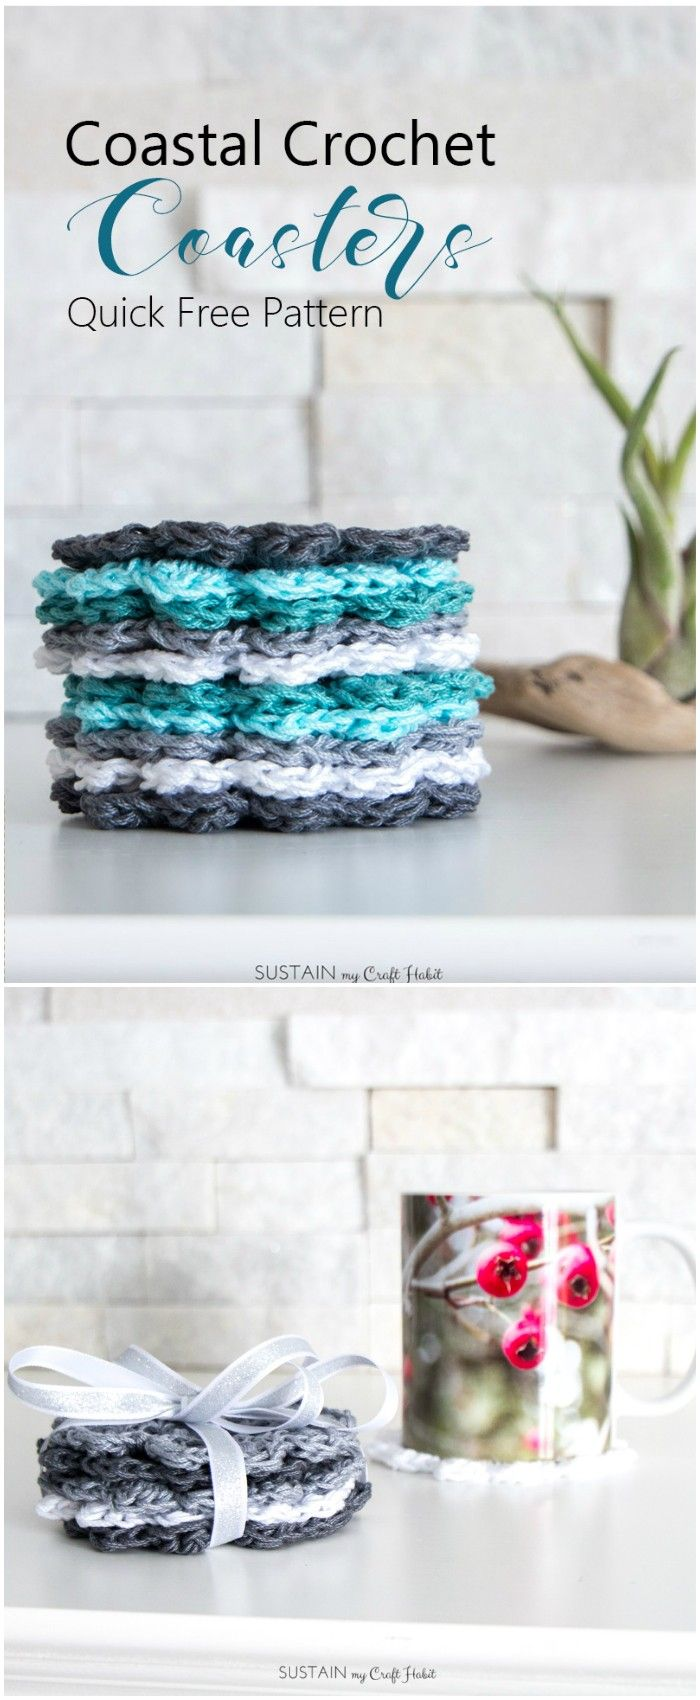 Free Crochet Coaster Patterns For Your Home | Crochet | Pinterest ...